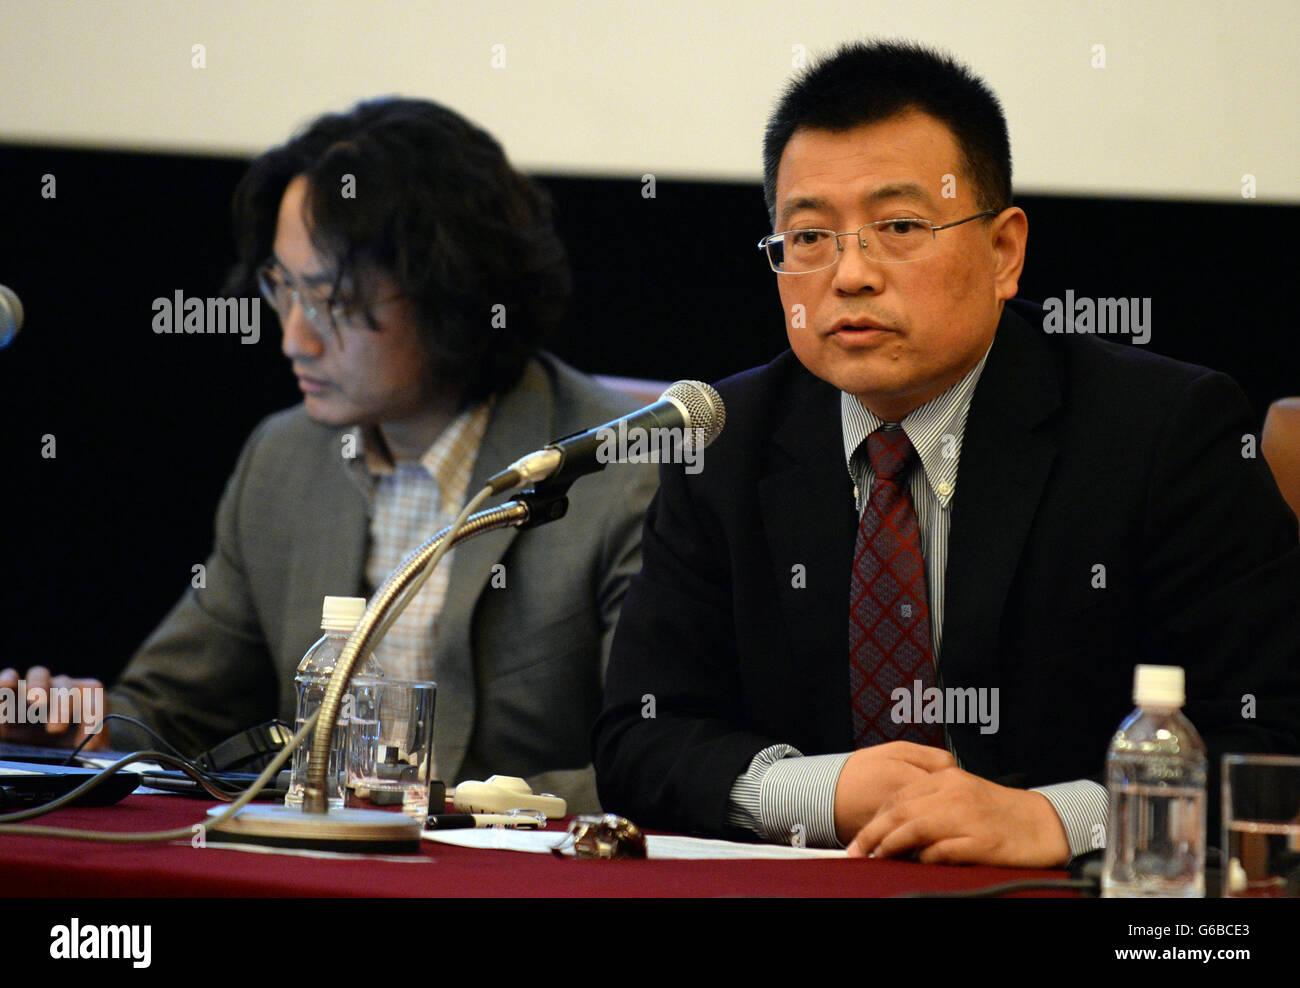 Tokyo, Japan. 24th June, 2016. Yu Tiejun (R), associate professor at the School of International Studies of Peking - Stock Image